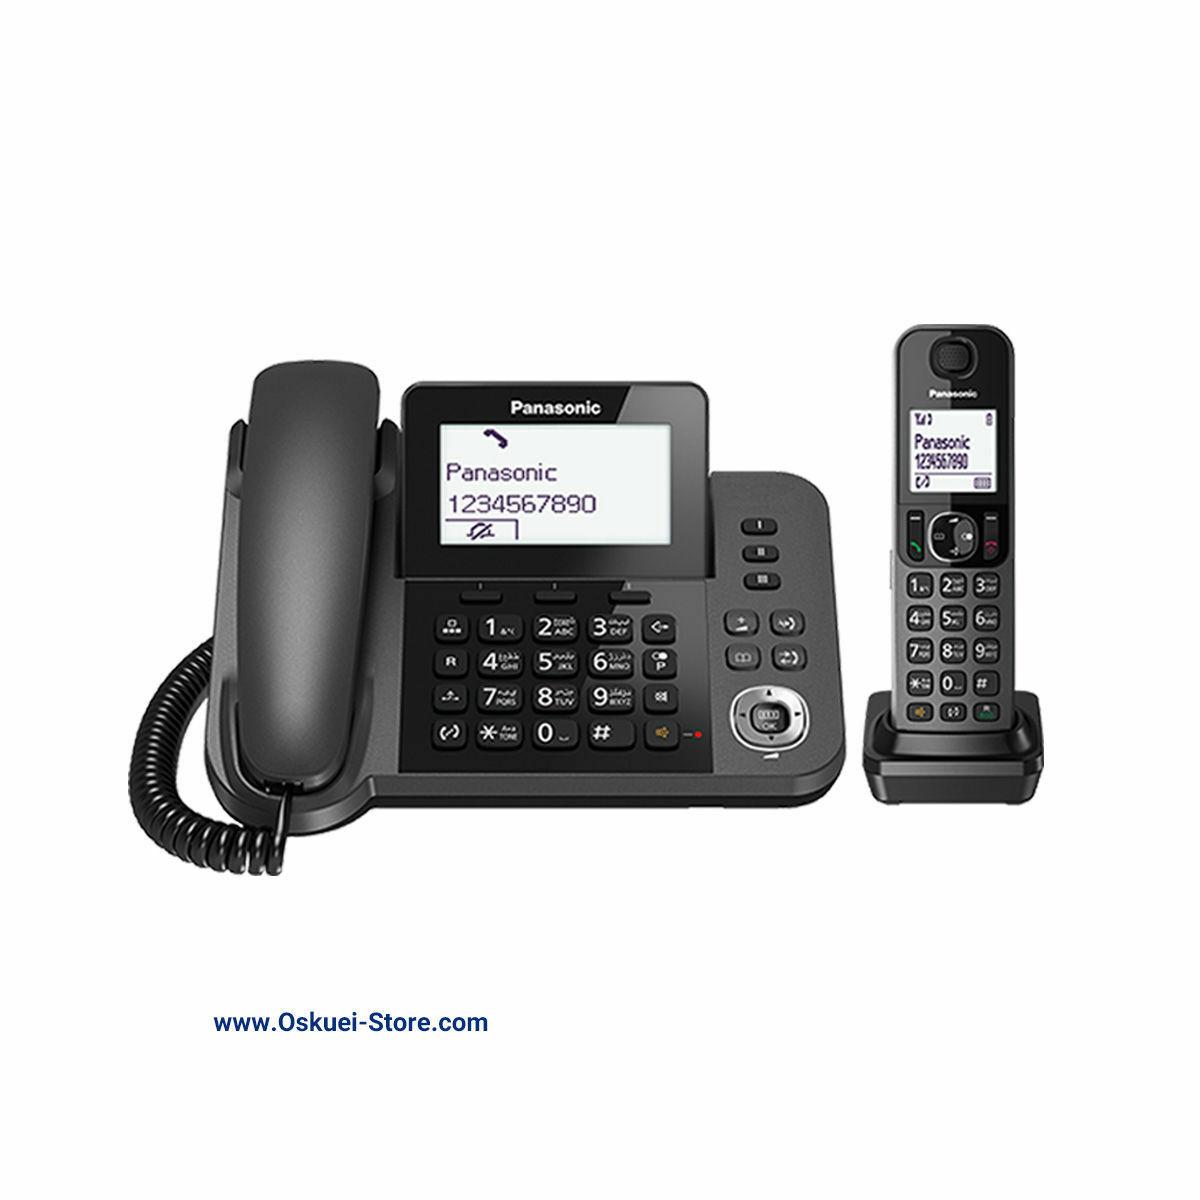 تلفن بي سيم پاناسونيک مدل KX-TGF310